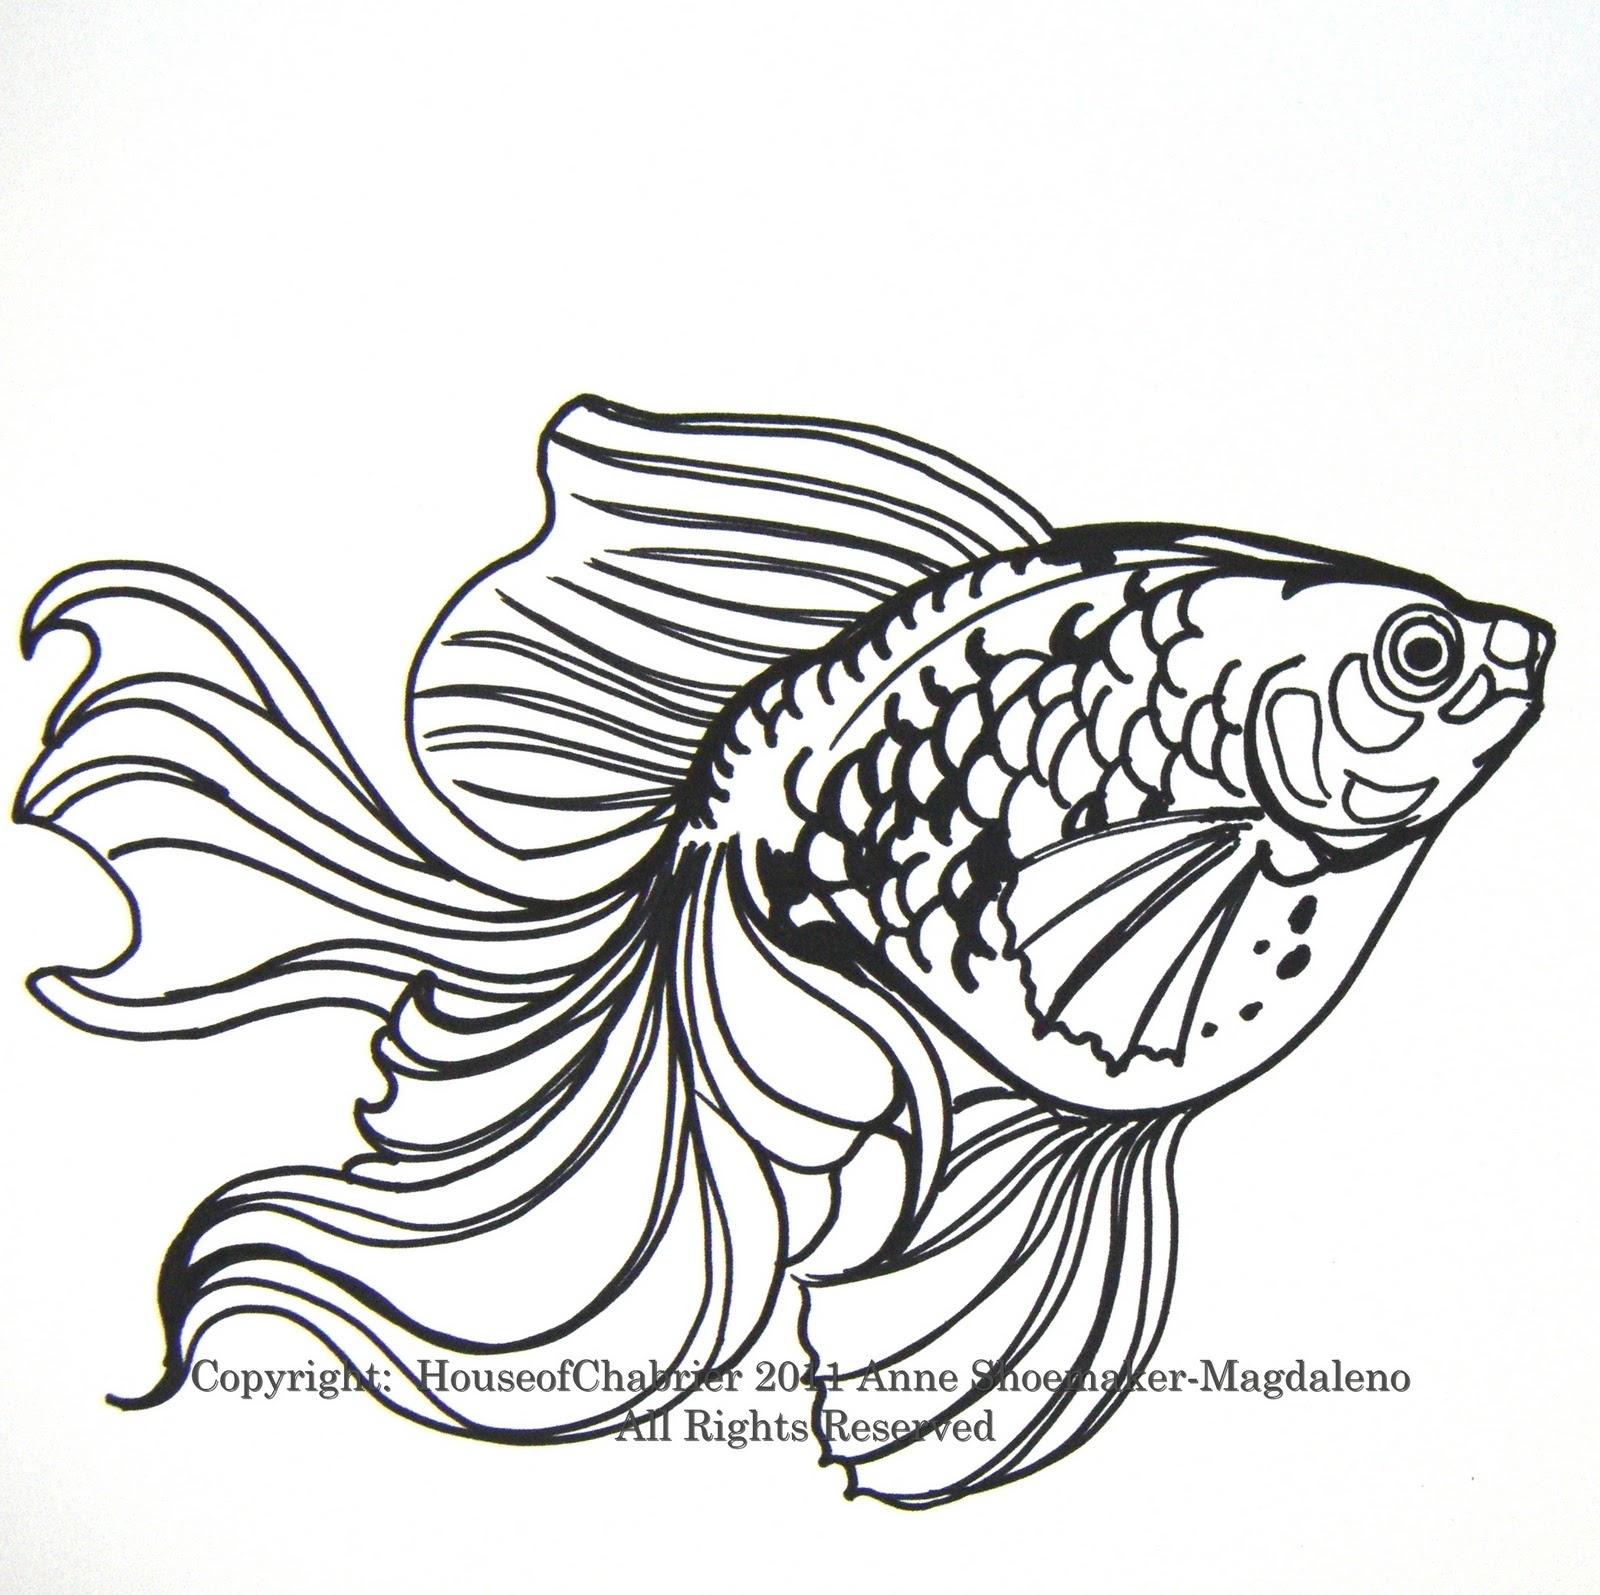 Goldfish line drawing - photo#7